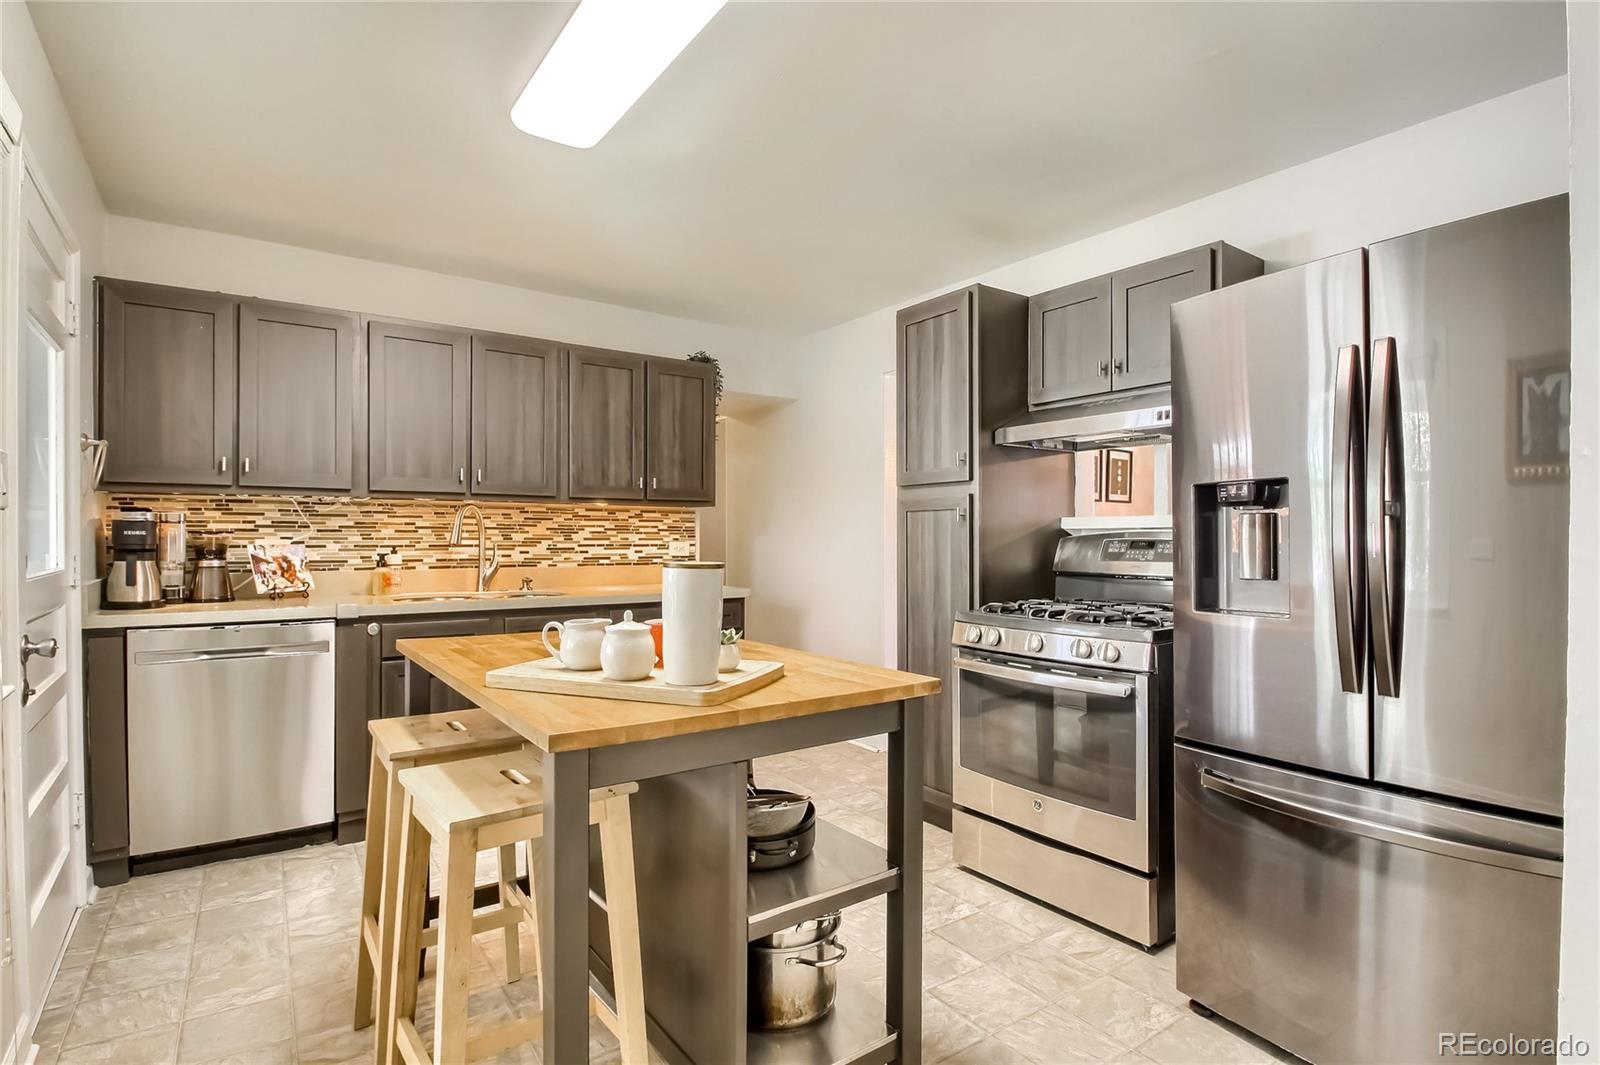 MLS# 6113287 - 2 - 1269 S Quivas Street, Denver, CO 80223